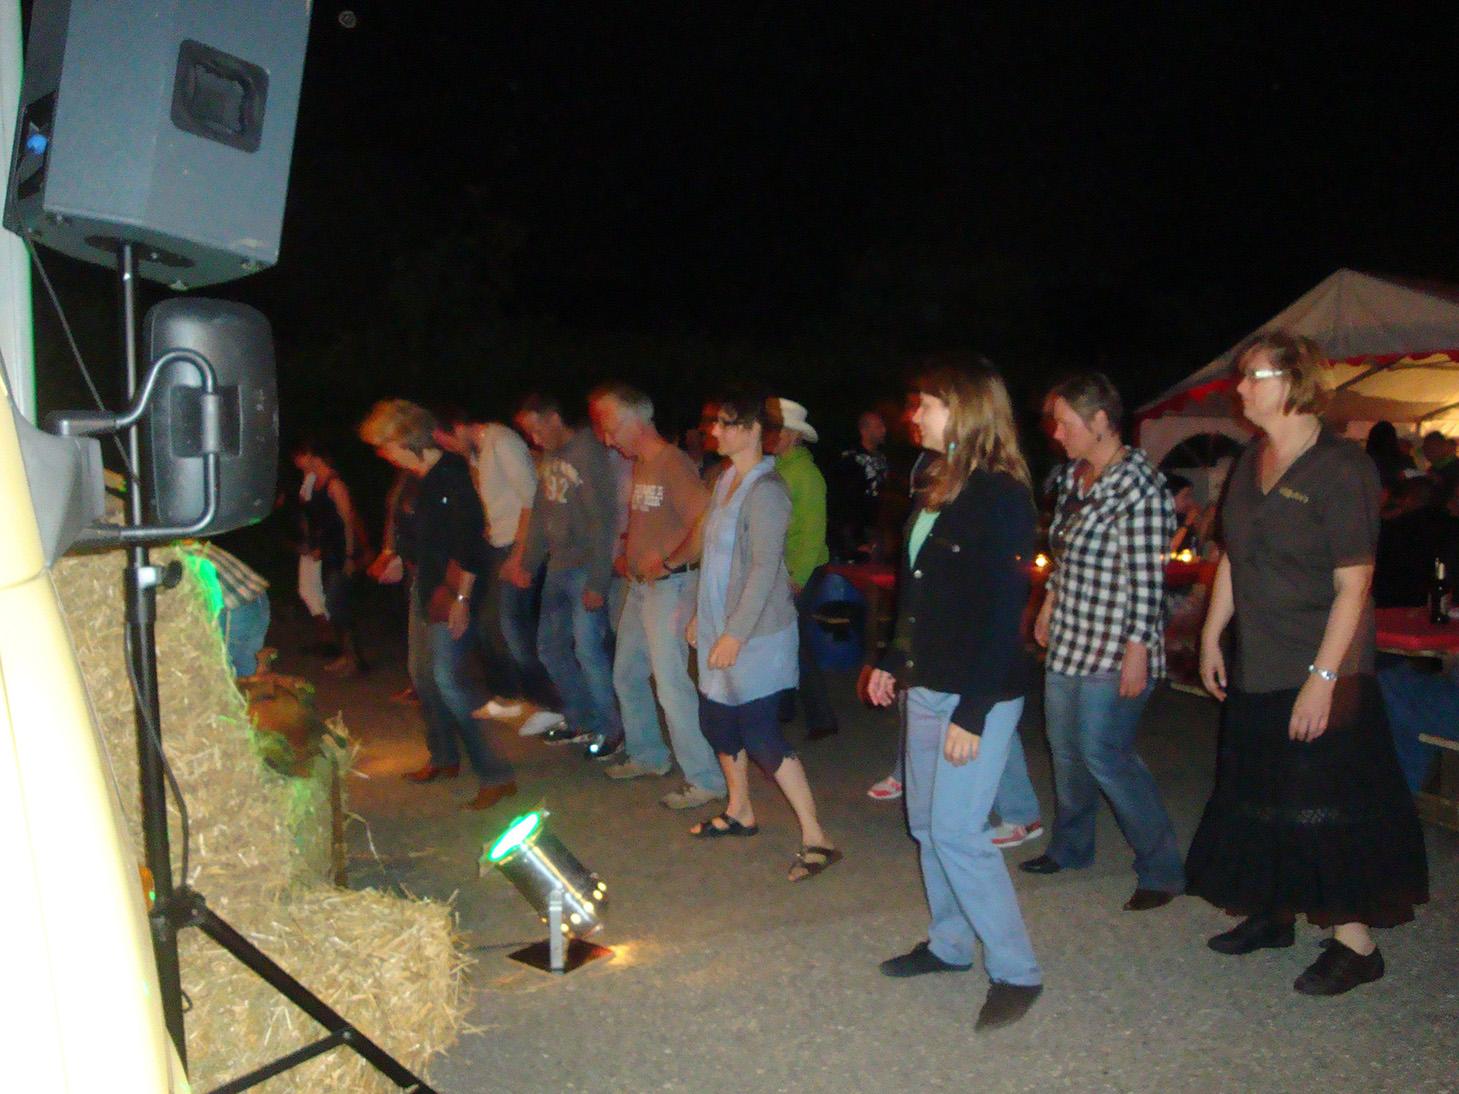 Country_Summer_Night_091_Web